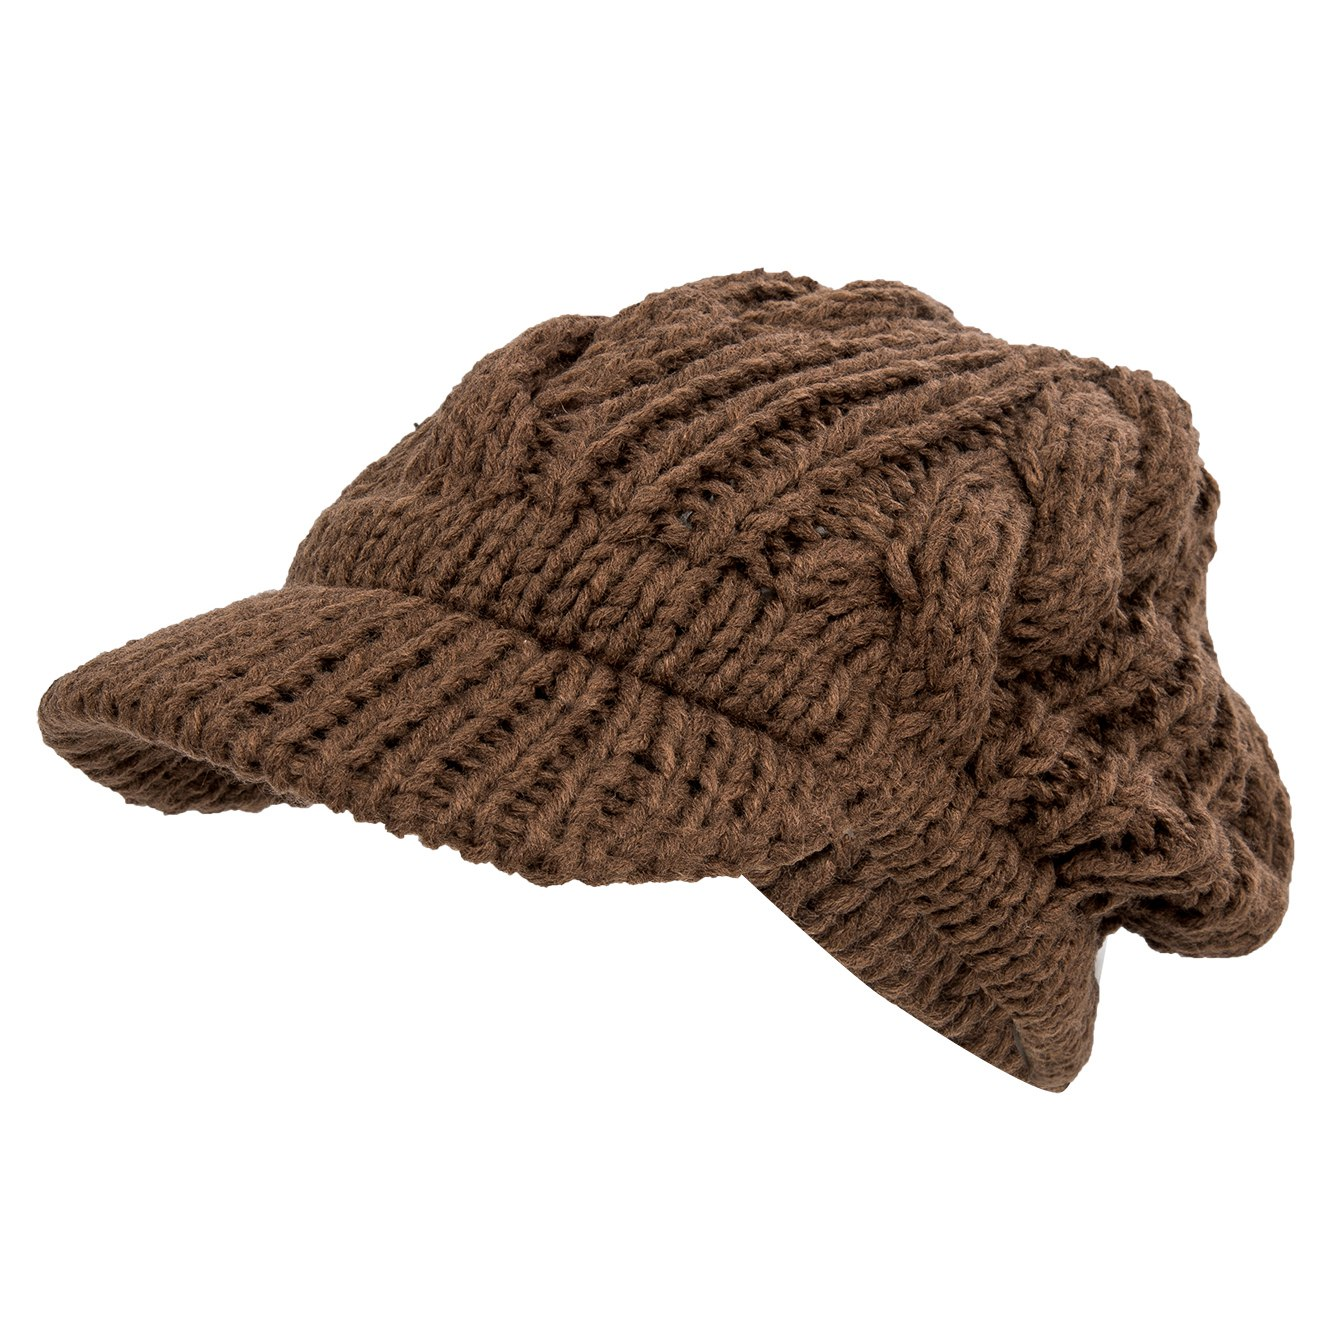 Women Slouchy Cabled Pattern Knit Beanie Crochet Rib Hat Warm HY eBay